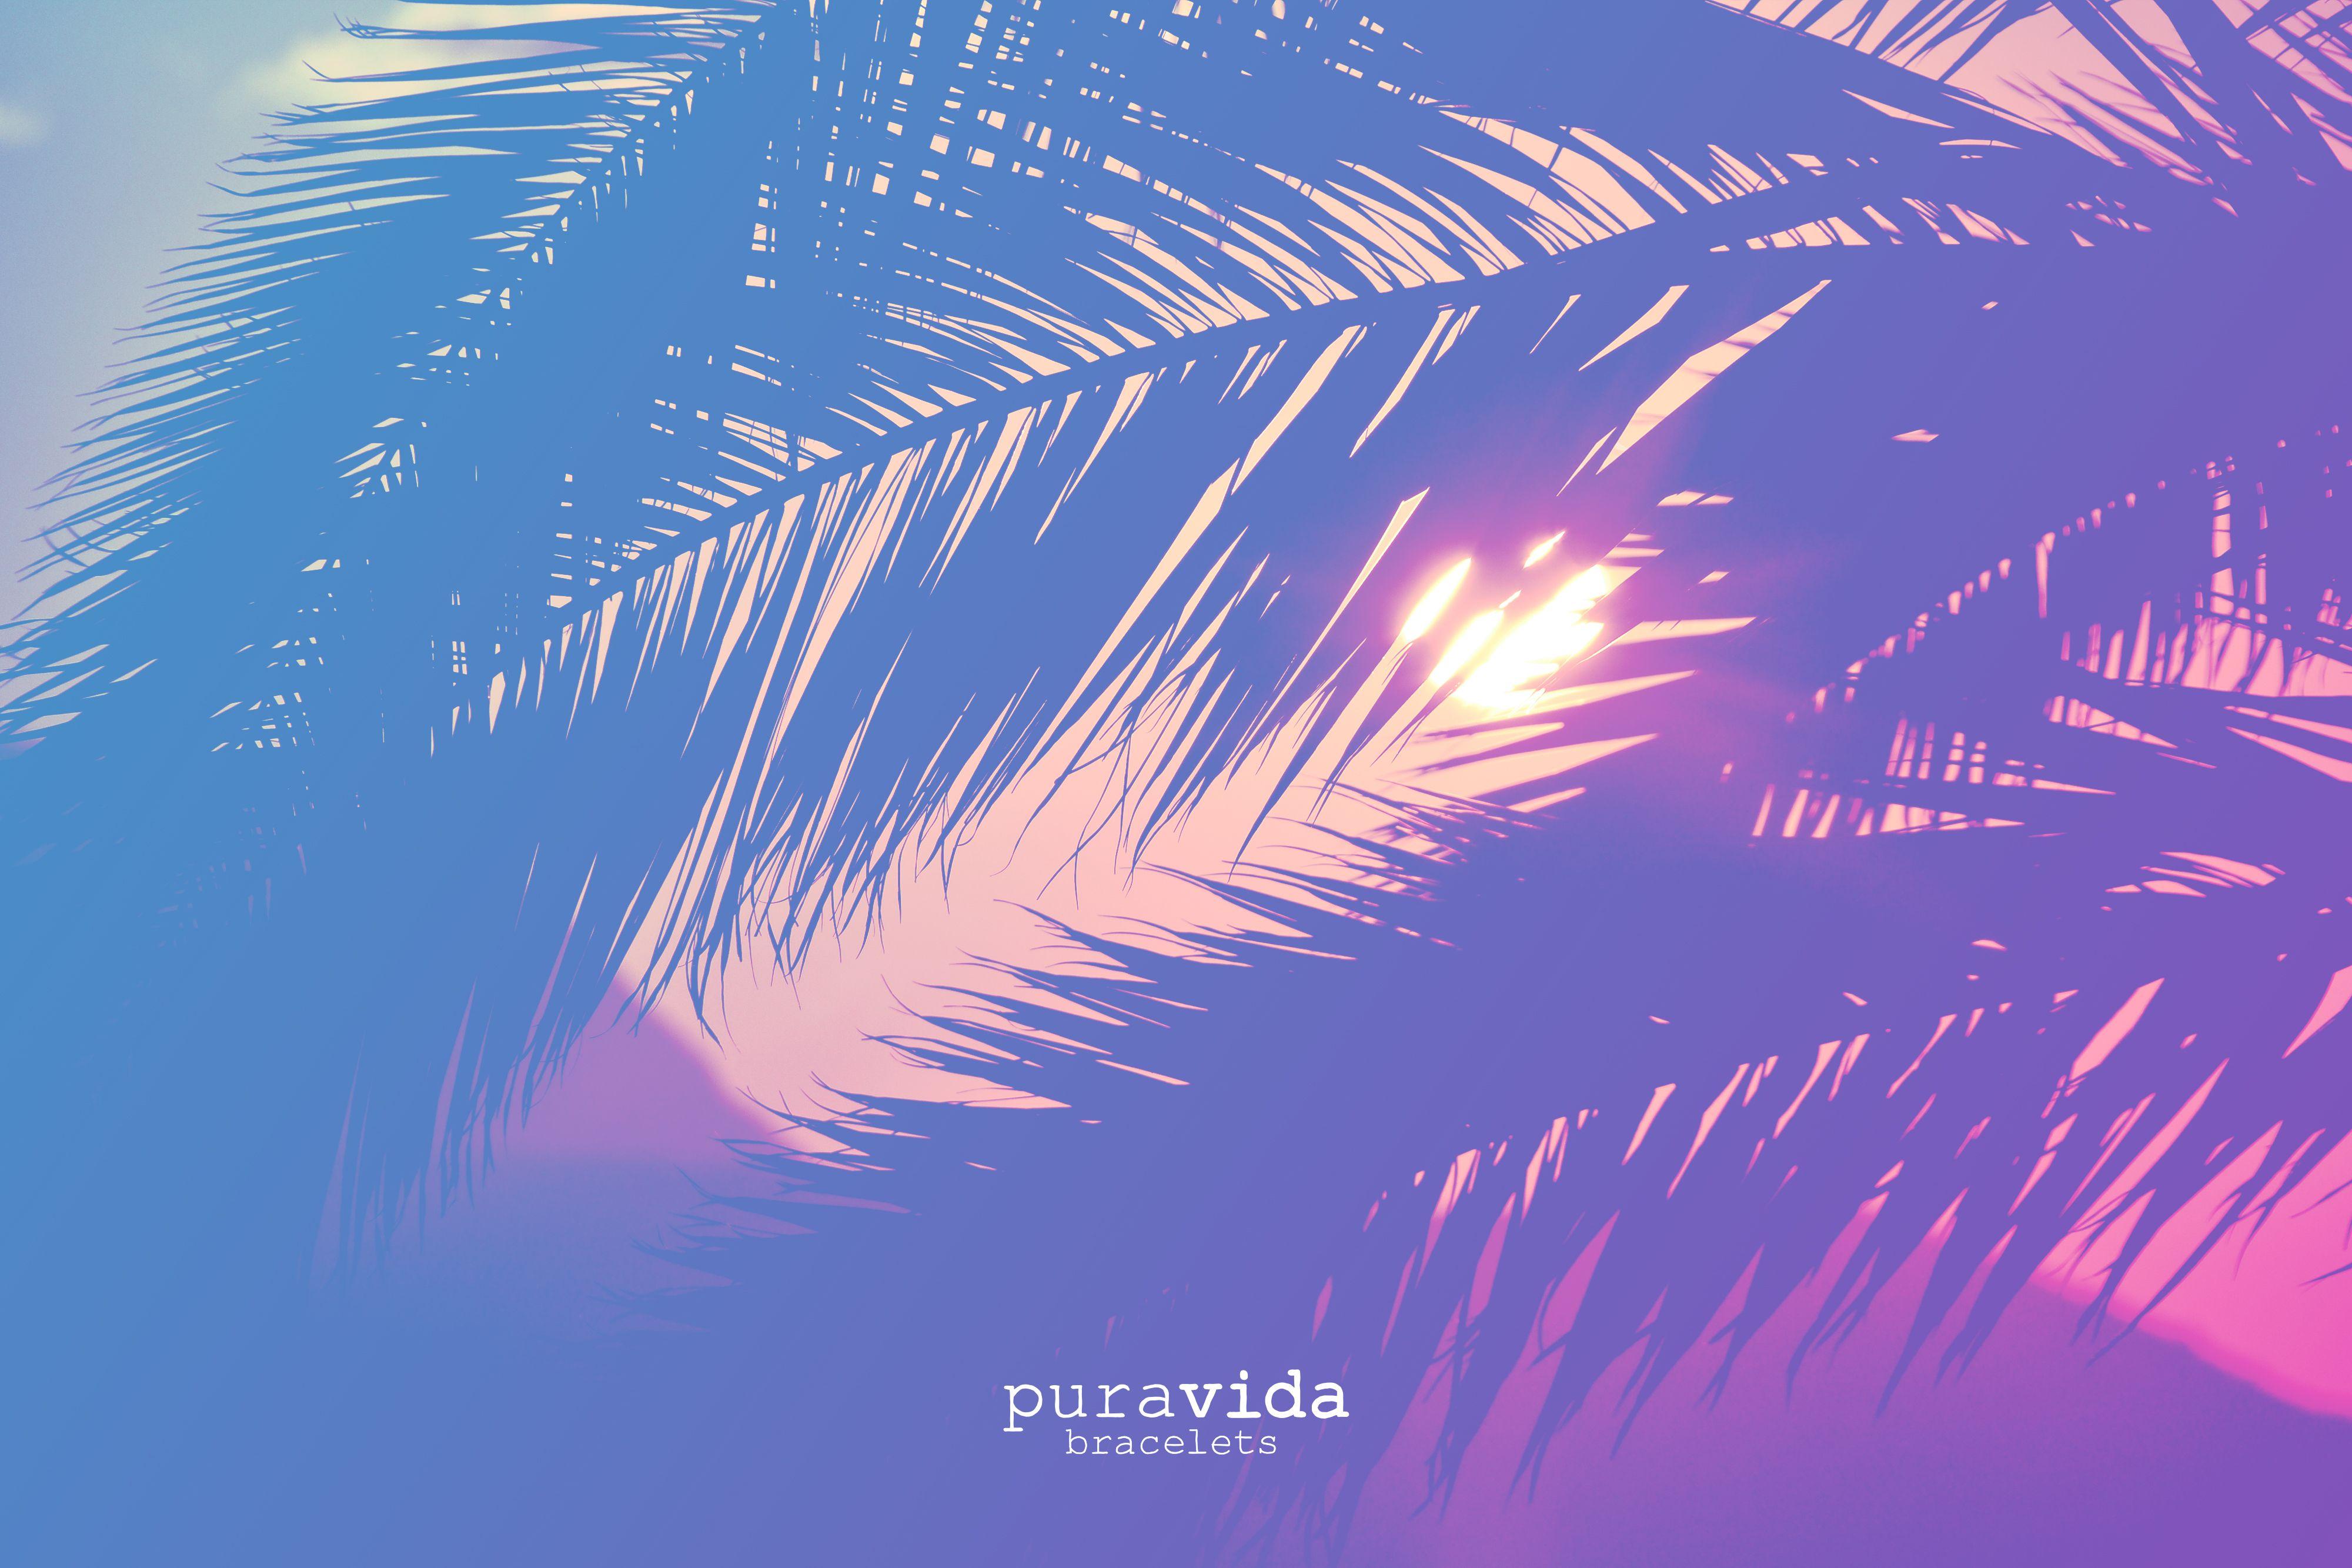 pura vida wallpaper  Dreamy Desktop Backgrounds | The Pura Vida Bracelets Blog ...